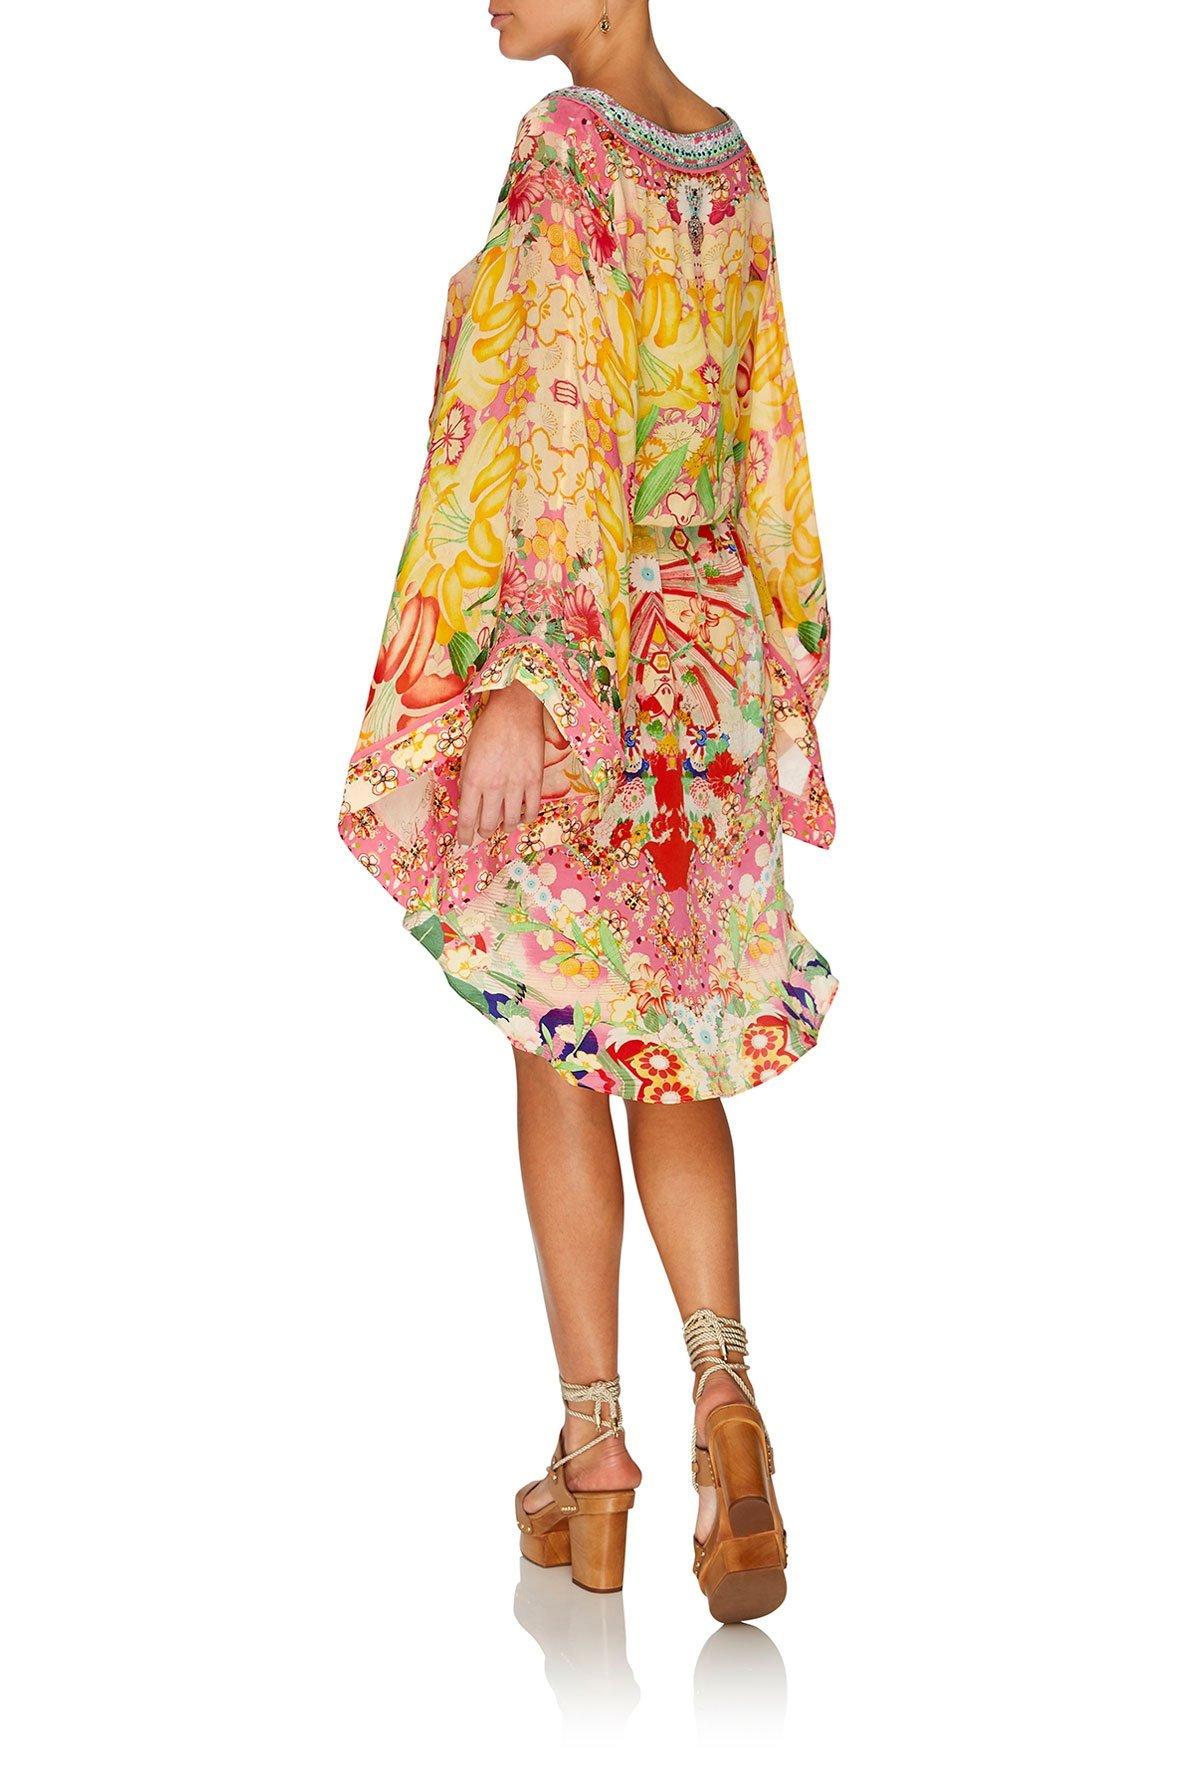 camilla_v_neck_kimono_dress_with_tie_kimono_kisses_4_1024x1024@2x